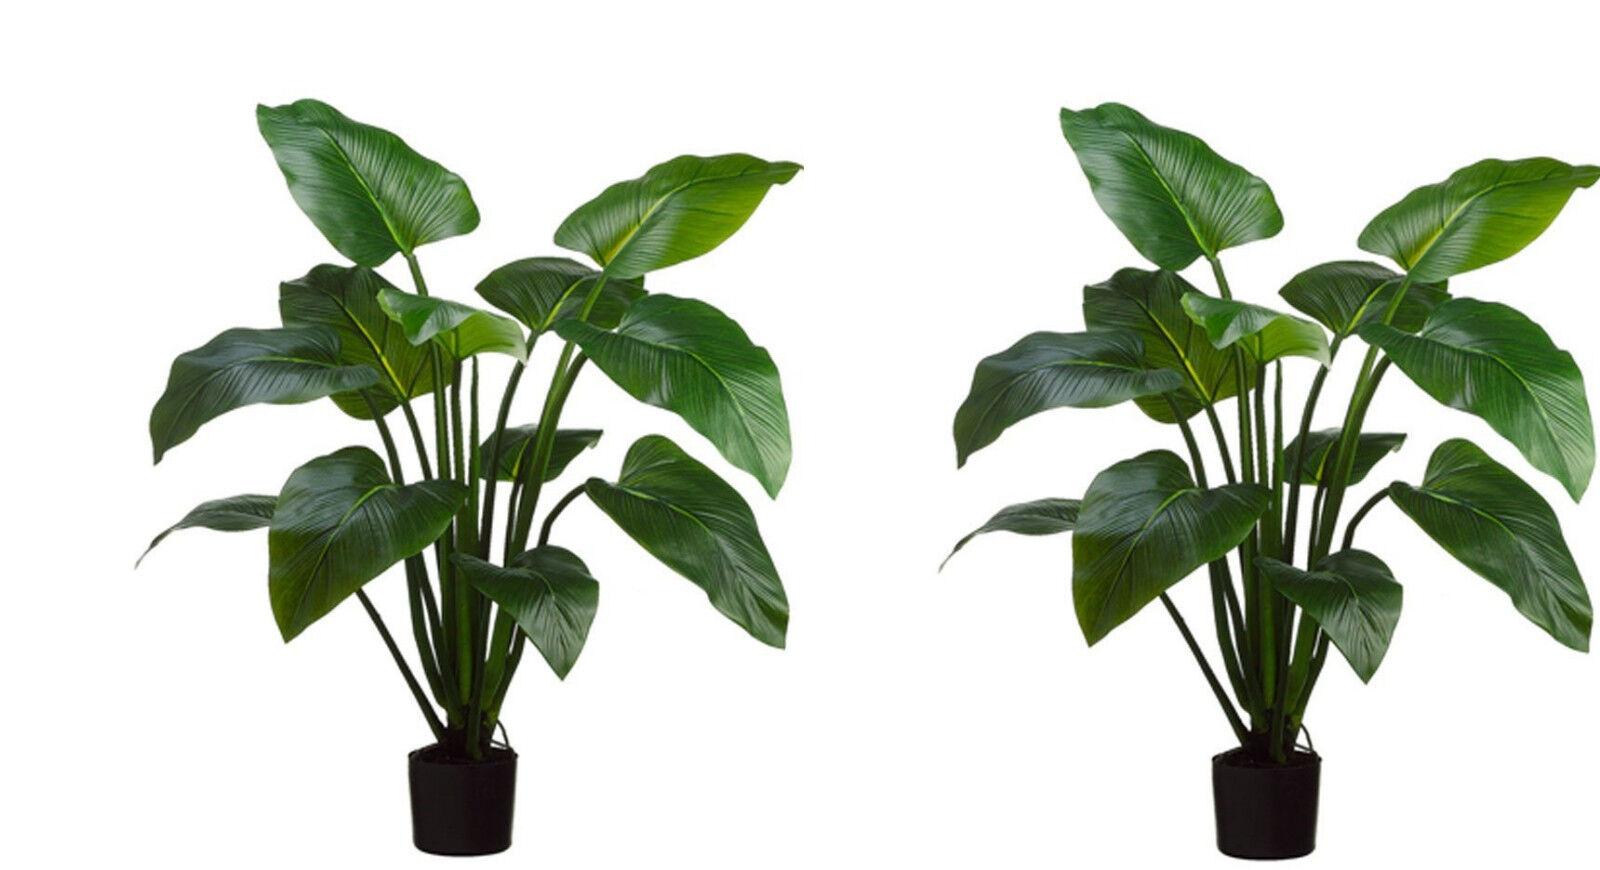 2 ARTIFICIAL PLANT 4' OUTDOOR UV PALM TREE TOPIARY EVA CURCUMA 5 3 6 POOL PATIO